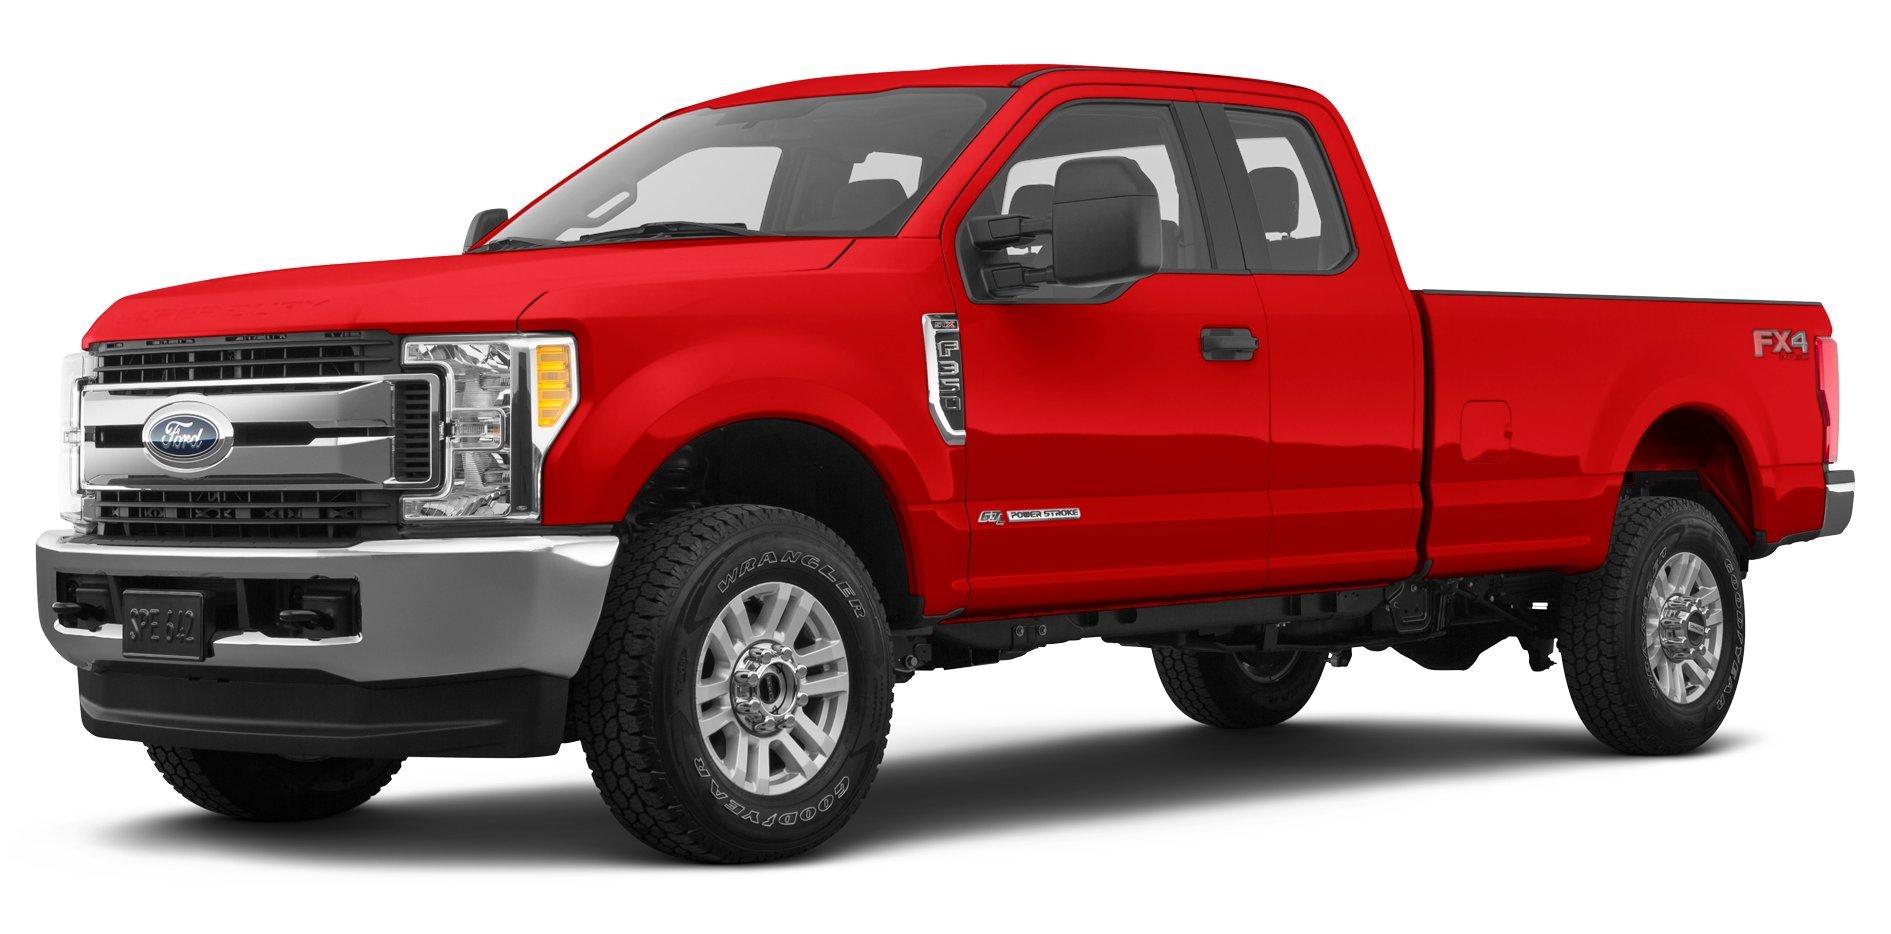 Amazon com: 2018 Chevrolet Colorado Reviews, Images, and Specs: Vehicles